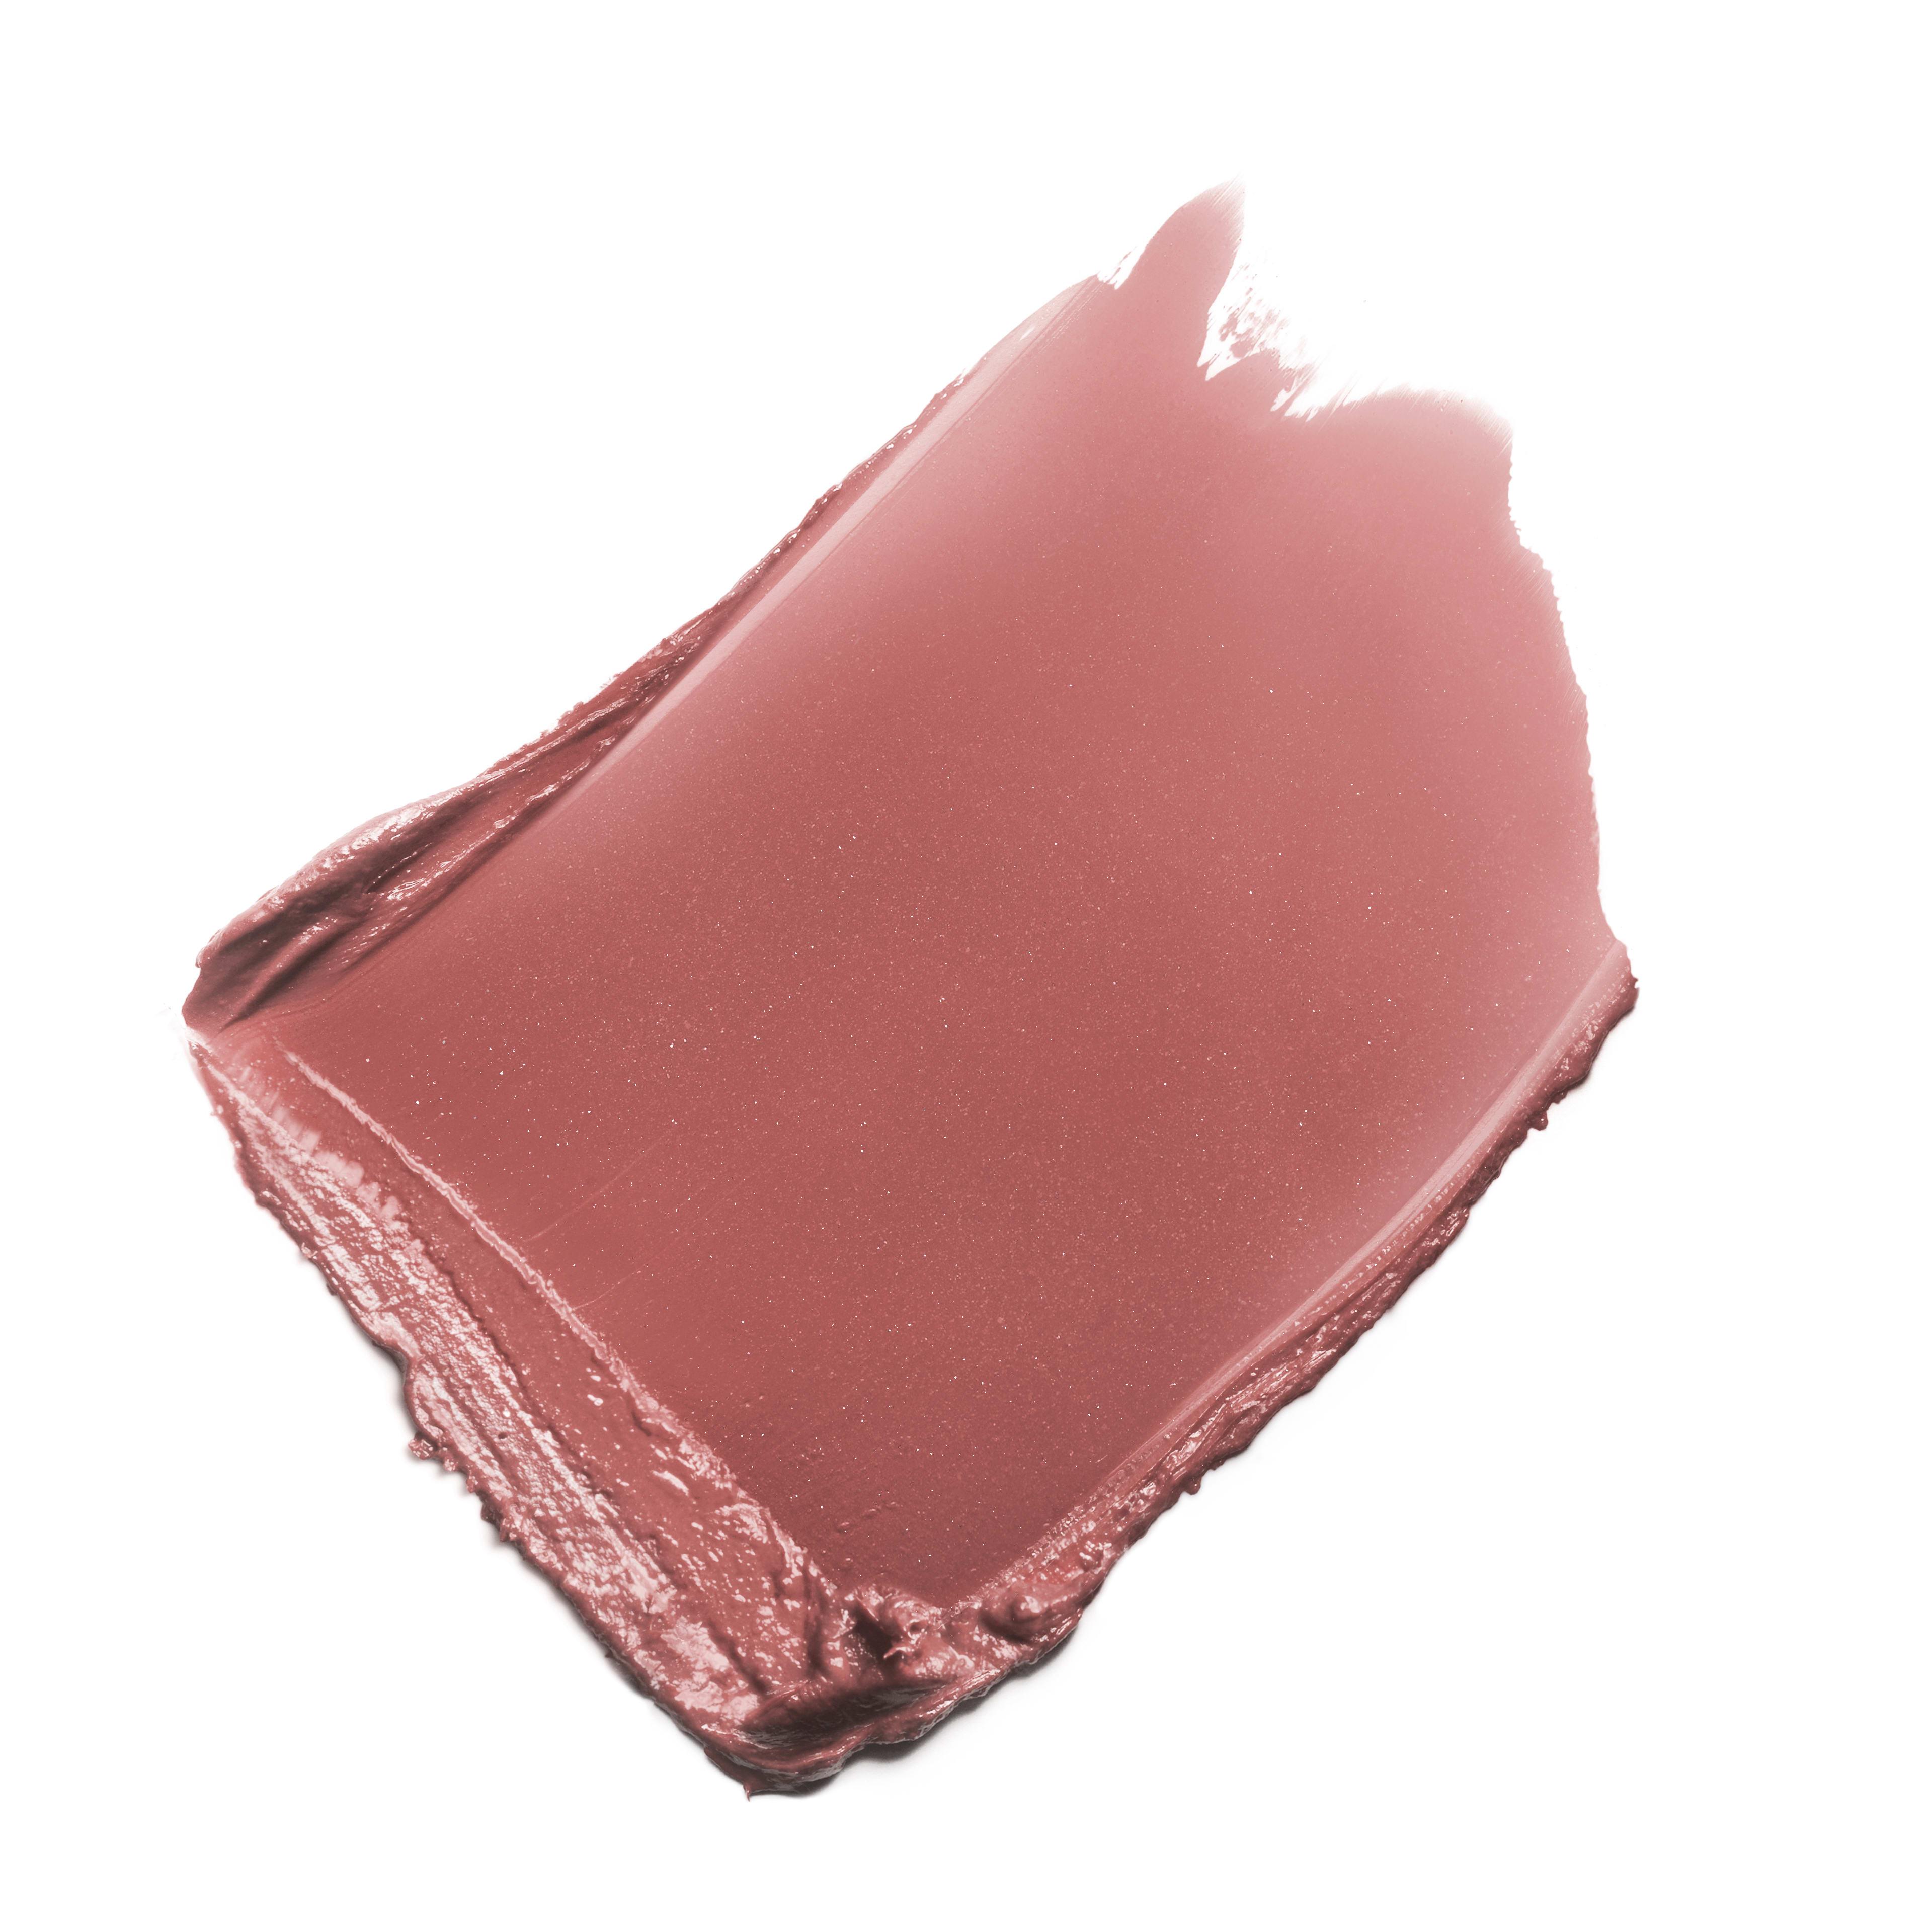 ROUGE COCO - makeup - 3.5g - มุมมองพื้นผิวธรรมดา